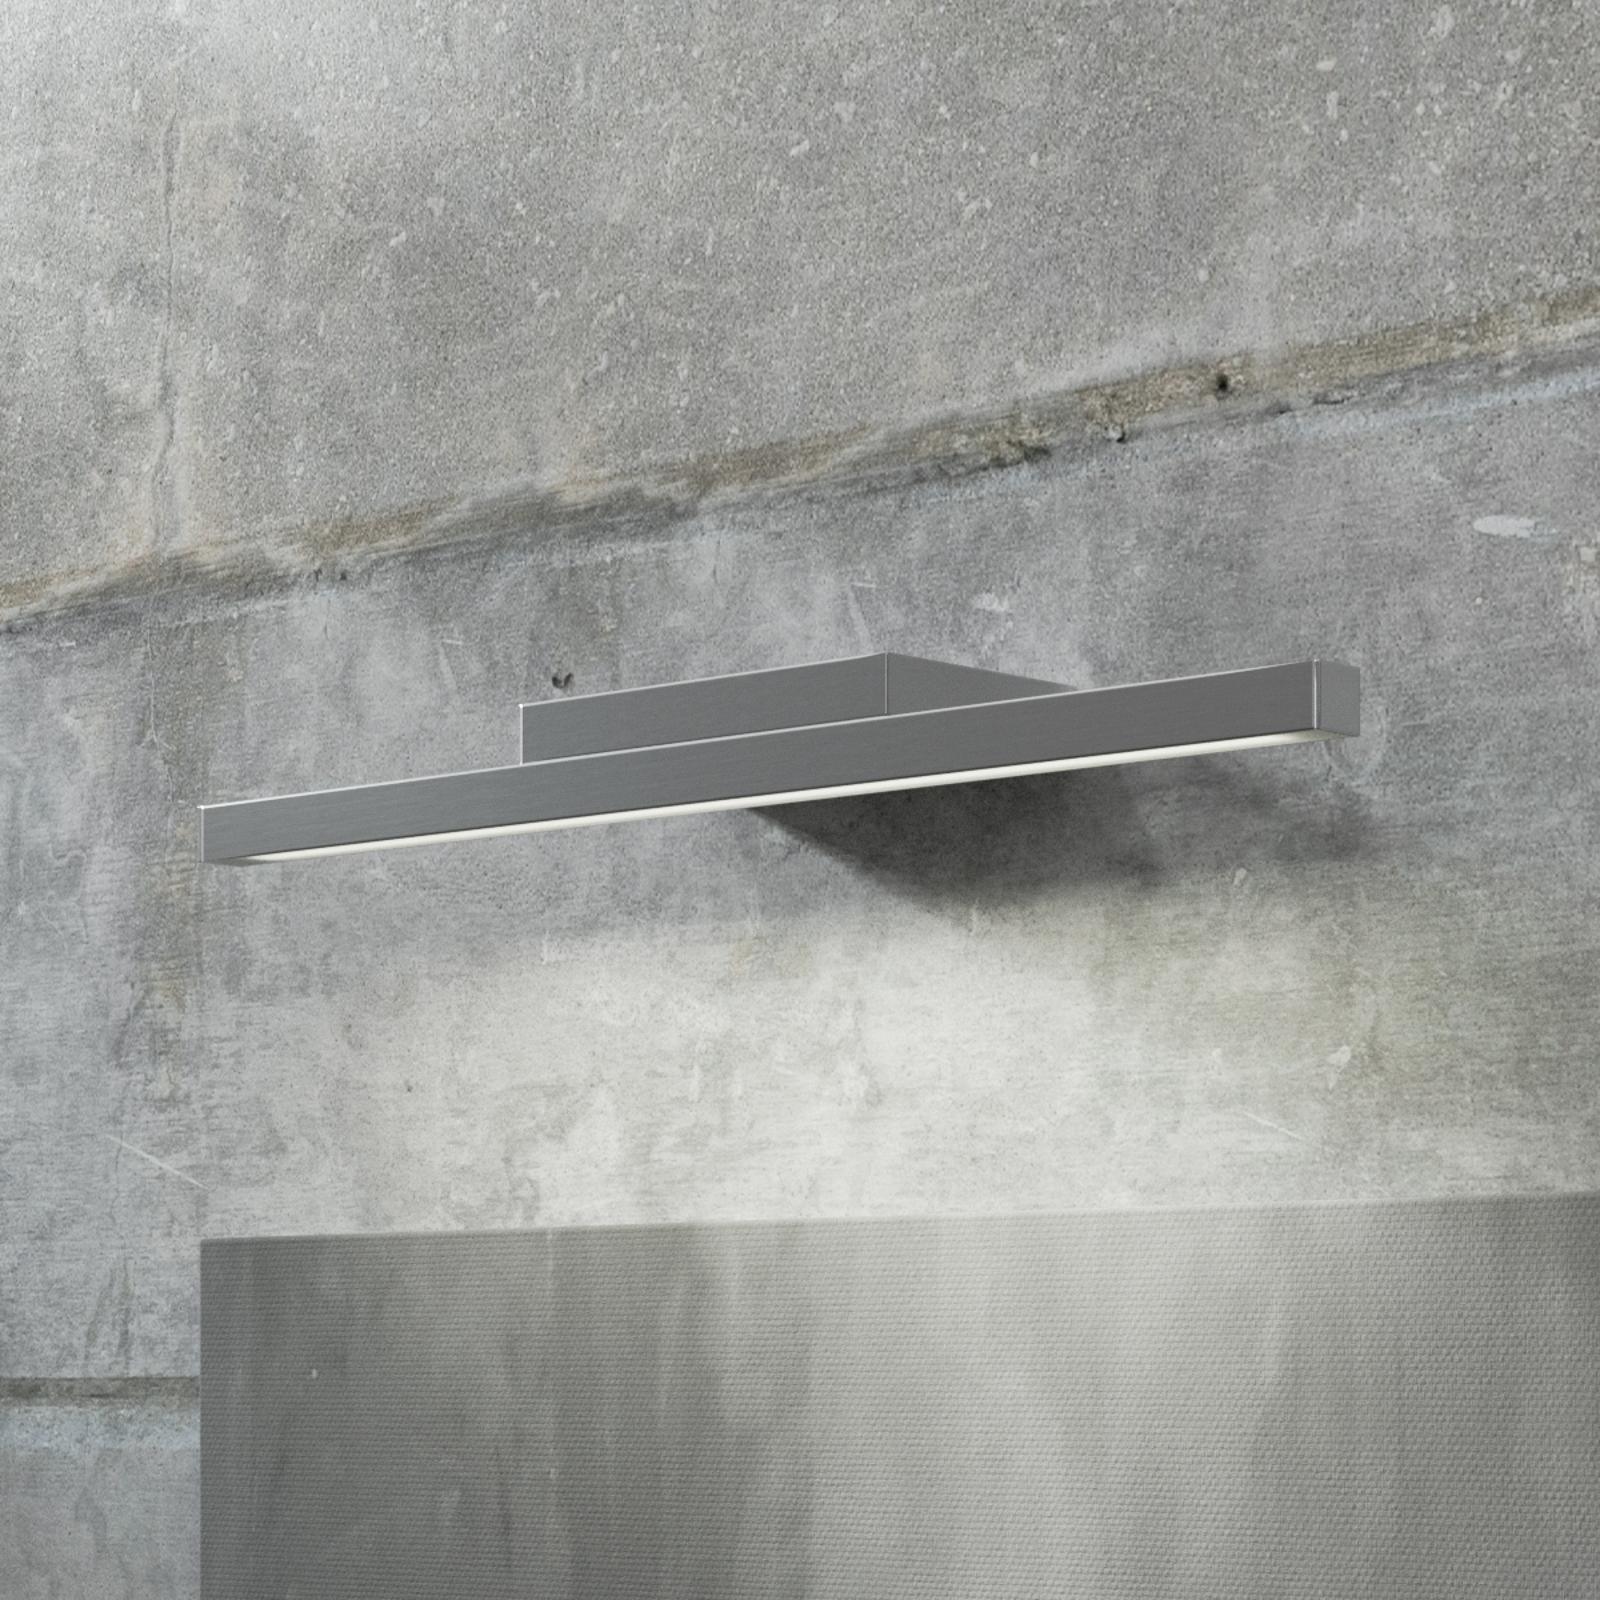 GROSSMANN Forte LED-vägglampa, förkromad 49,4 cm